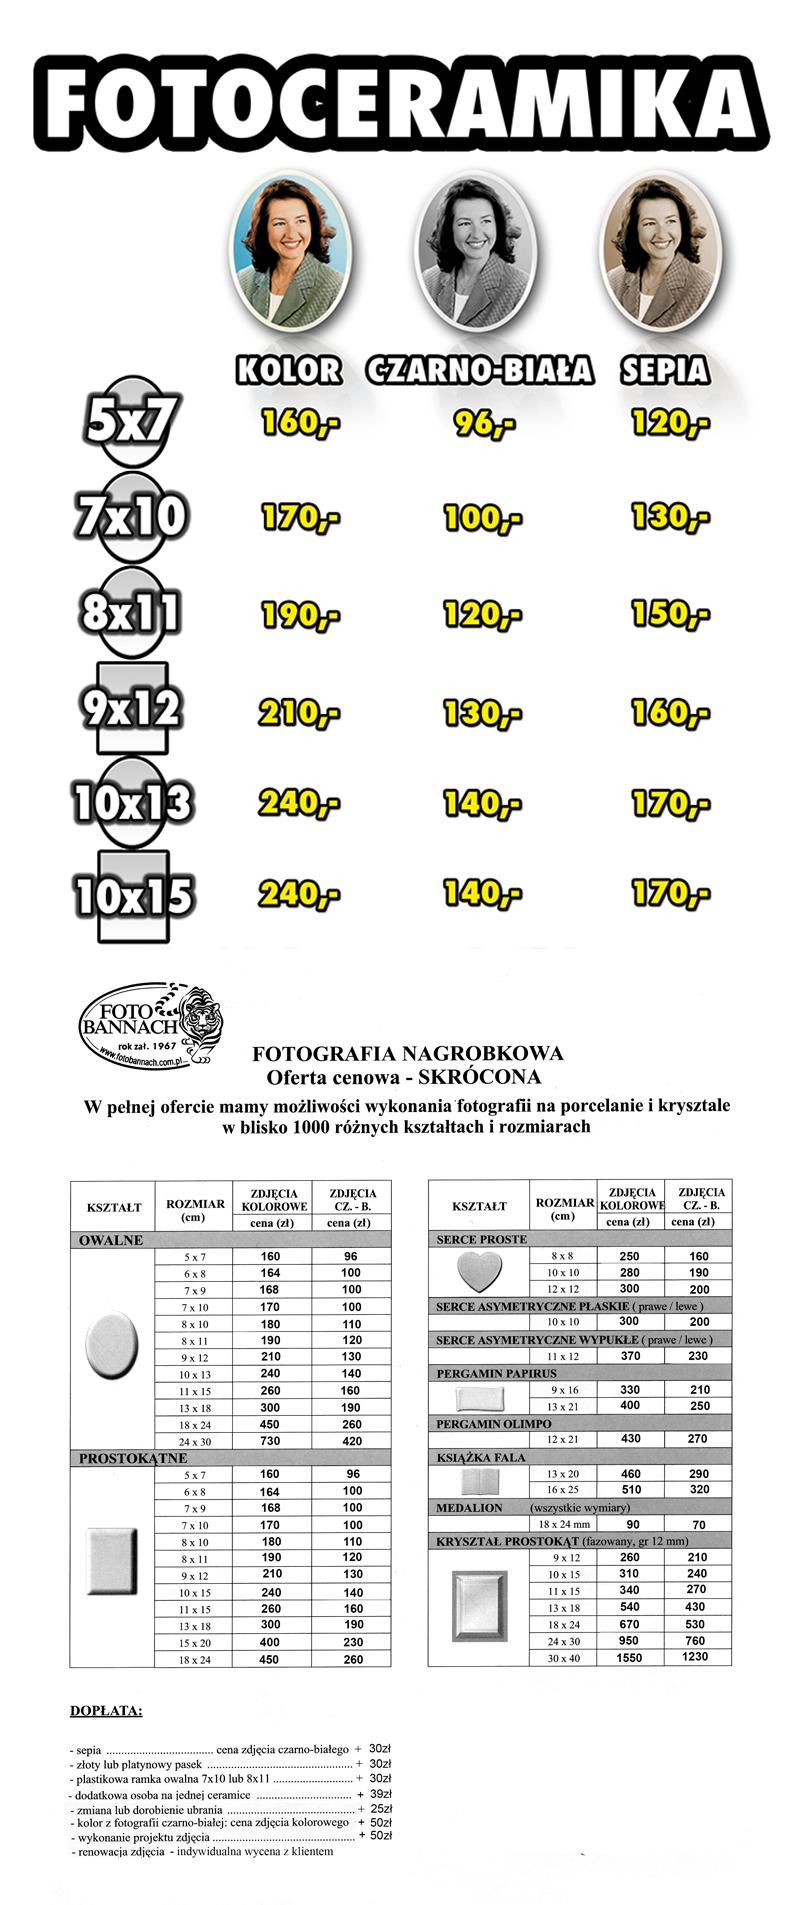 fotoceramika